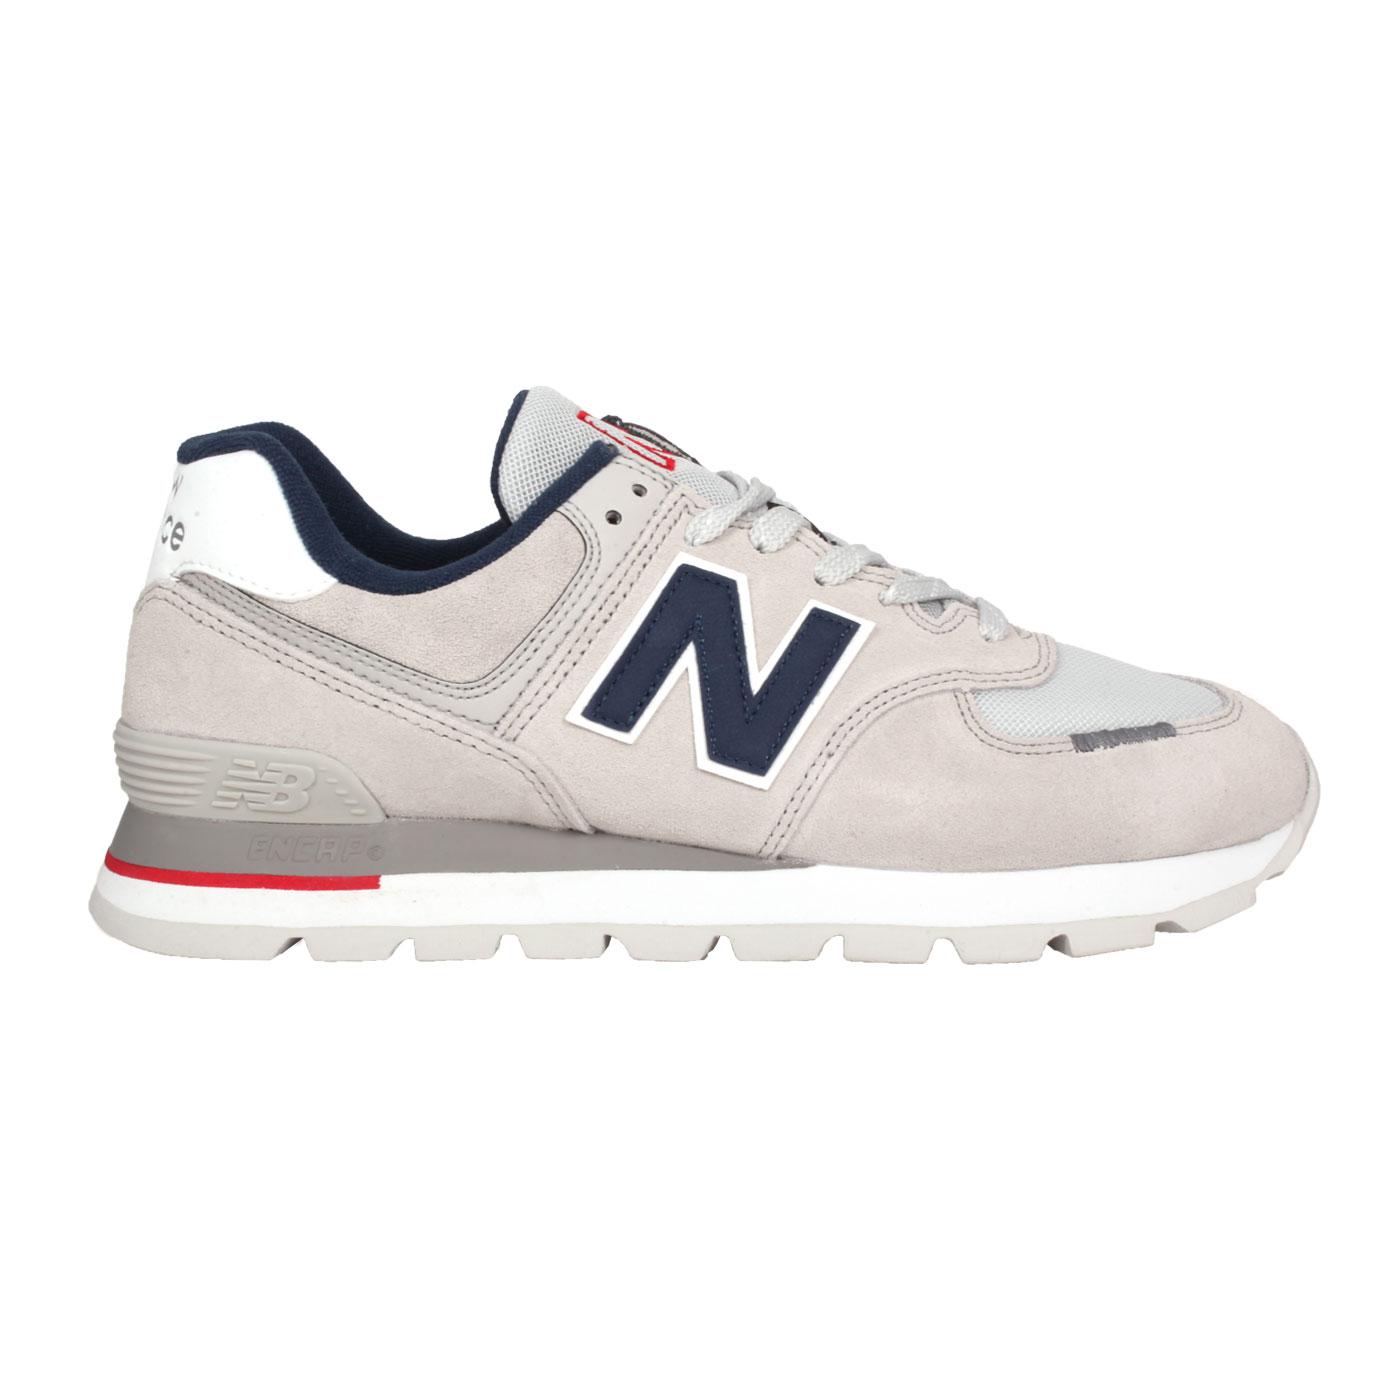 NEW BALANCE 男款復古運動鞋 ML574DTC - 淺灰丈青紅